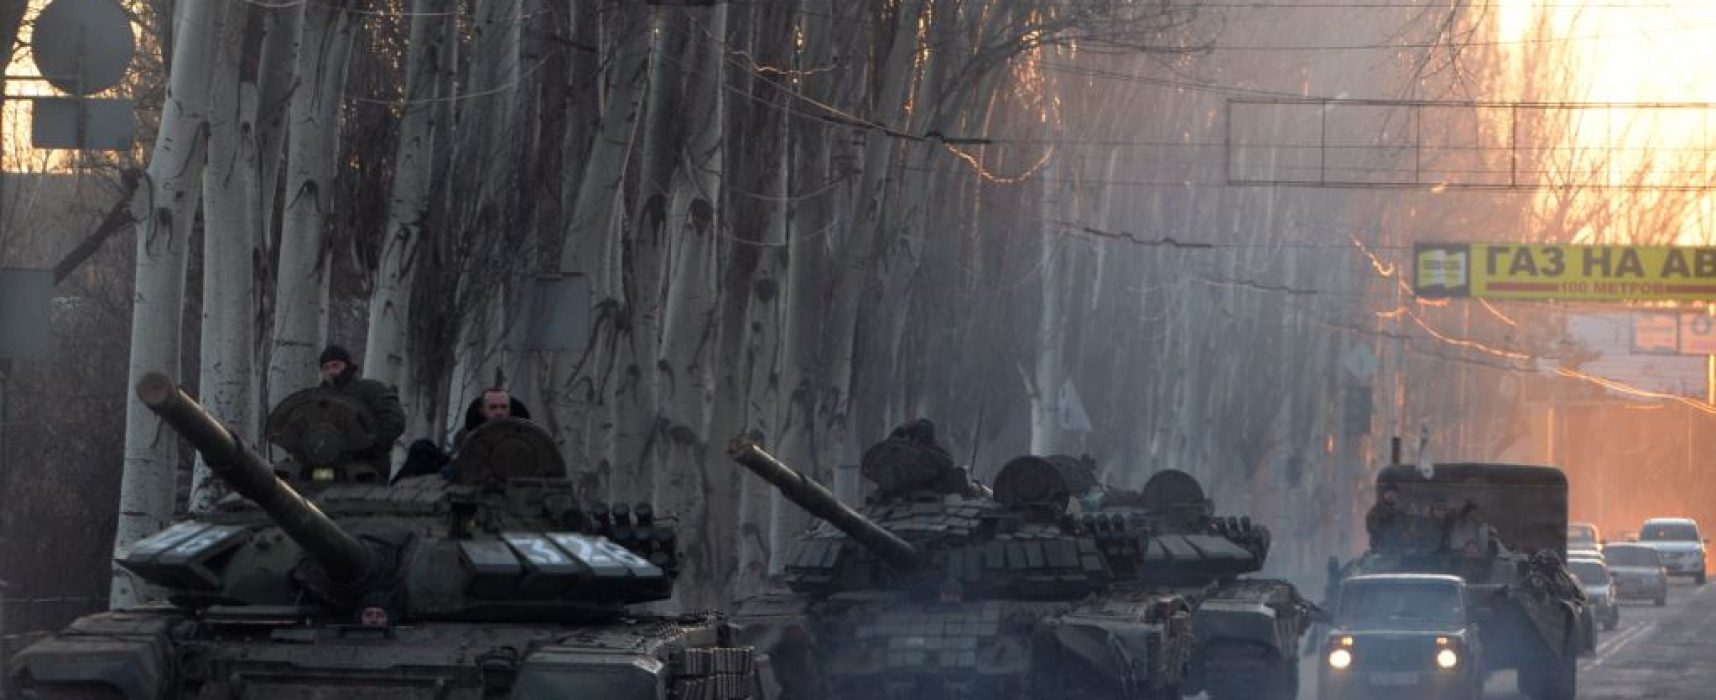 Moscow falsely accuses Ukraine of violating Friendship Treaty